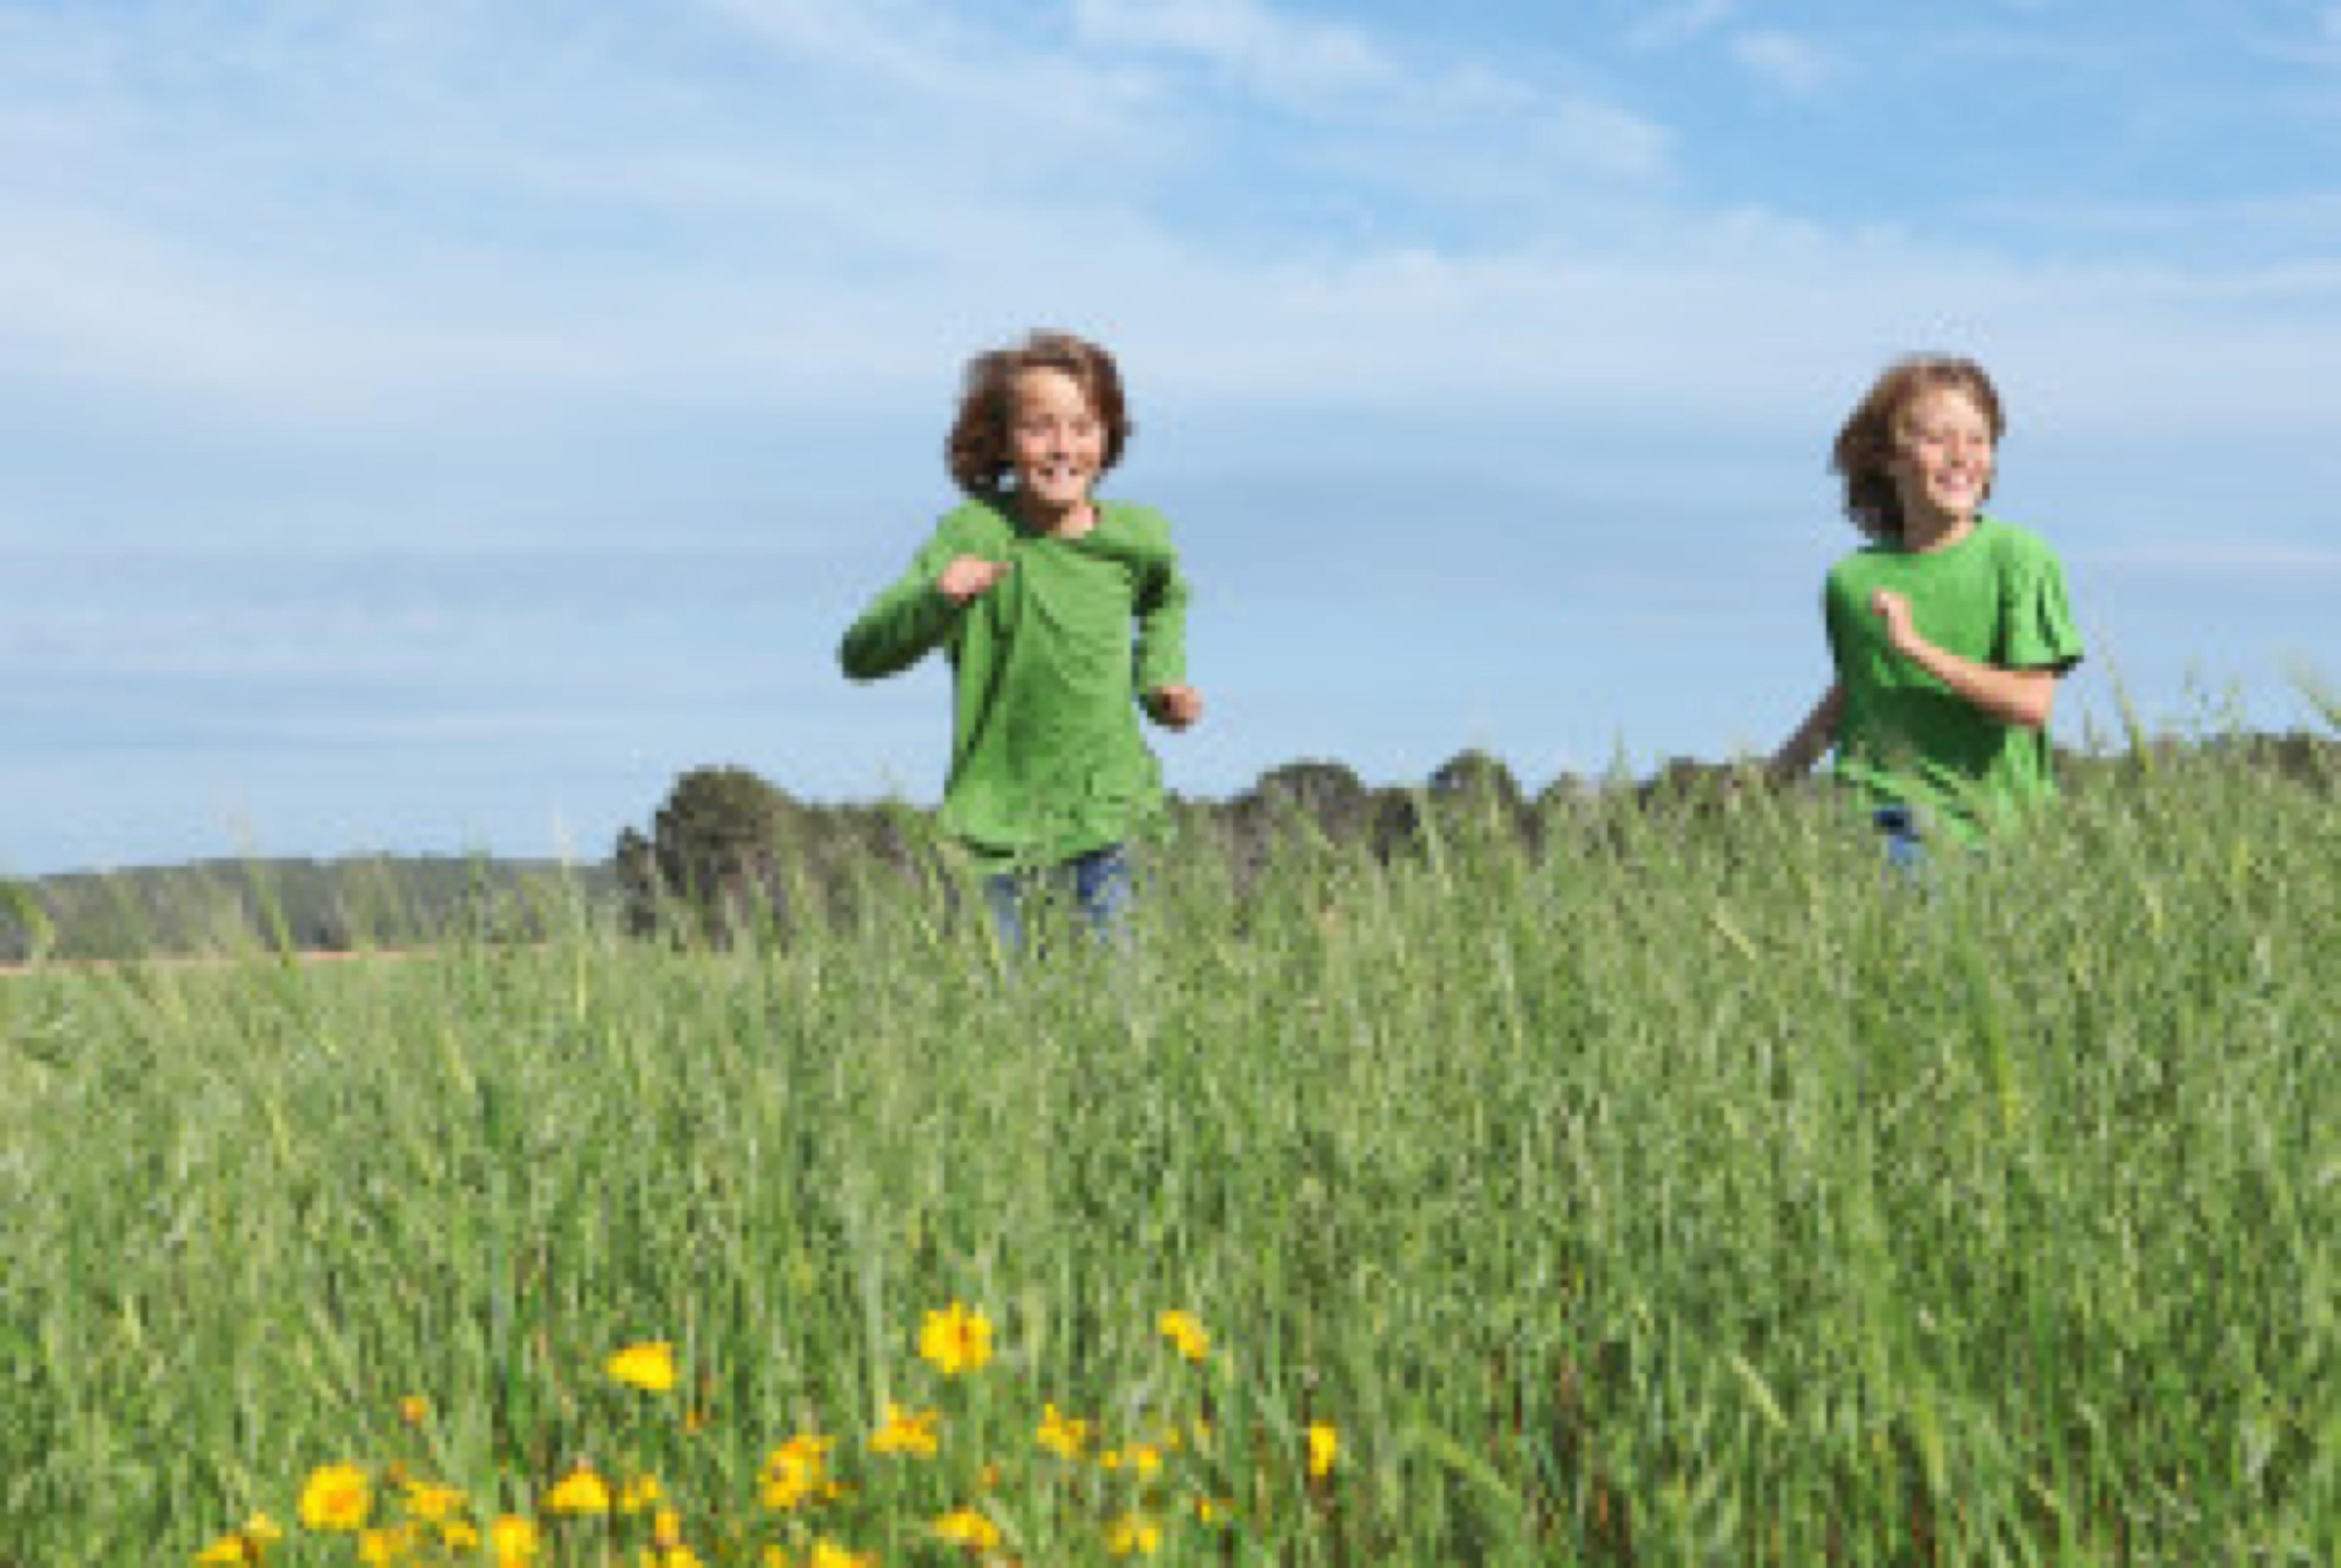 happy kids running outdoors in summer